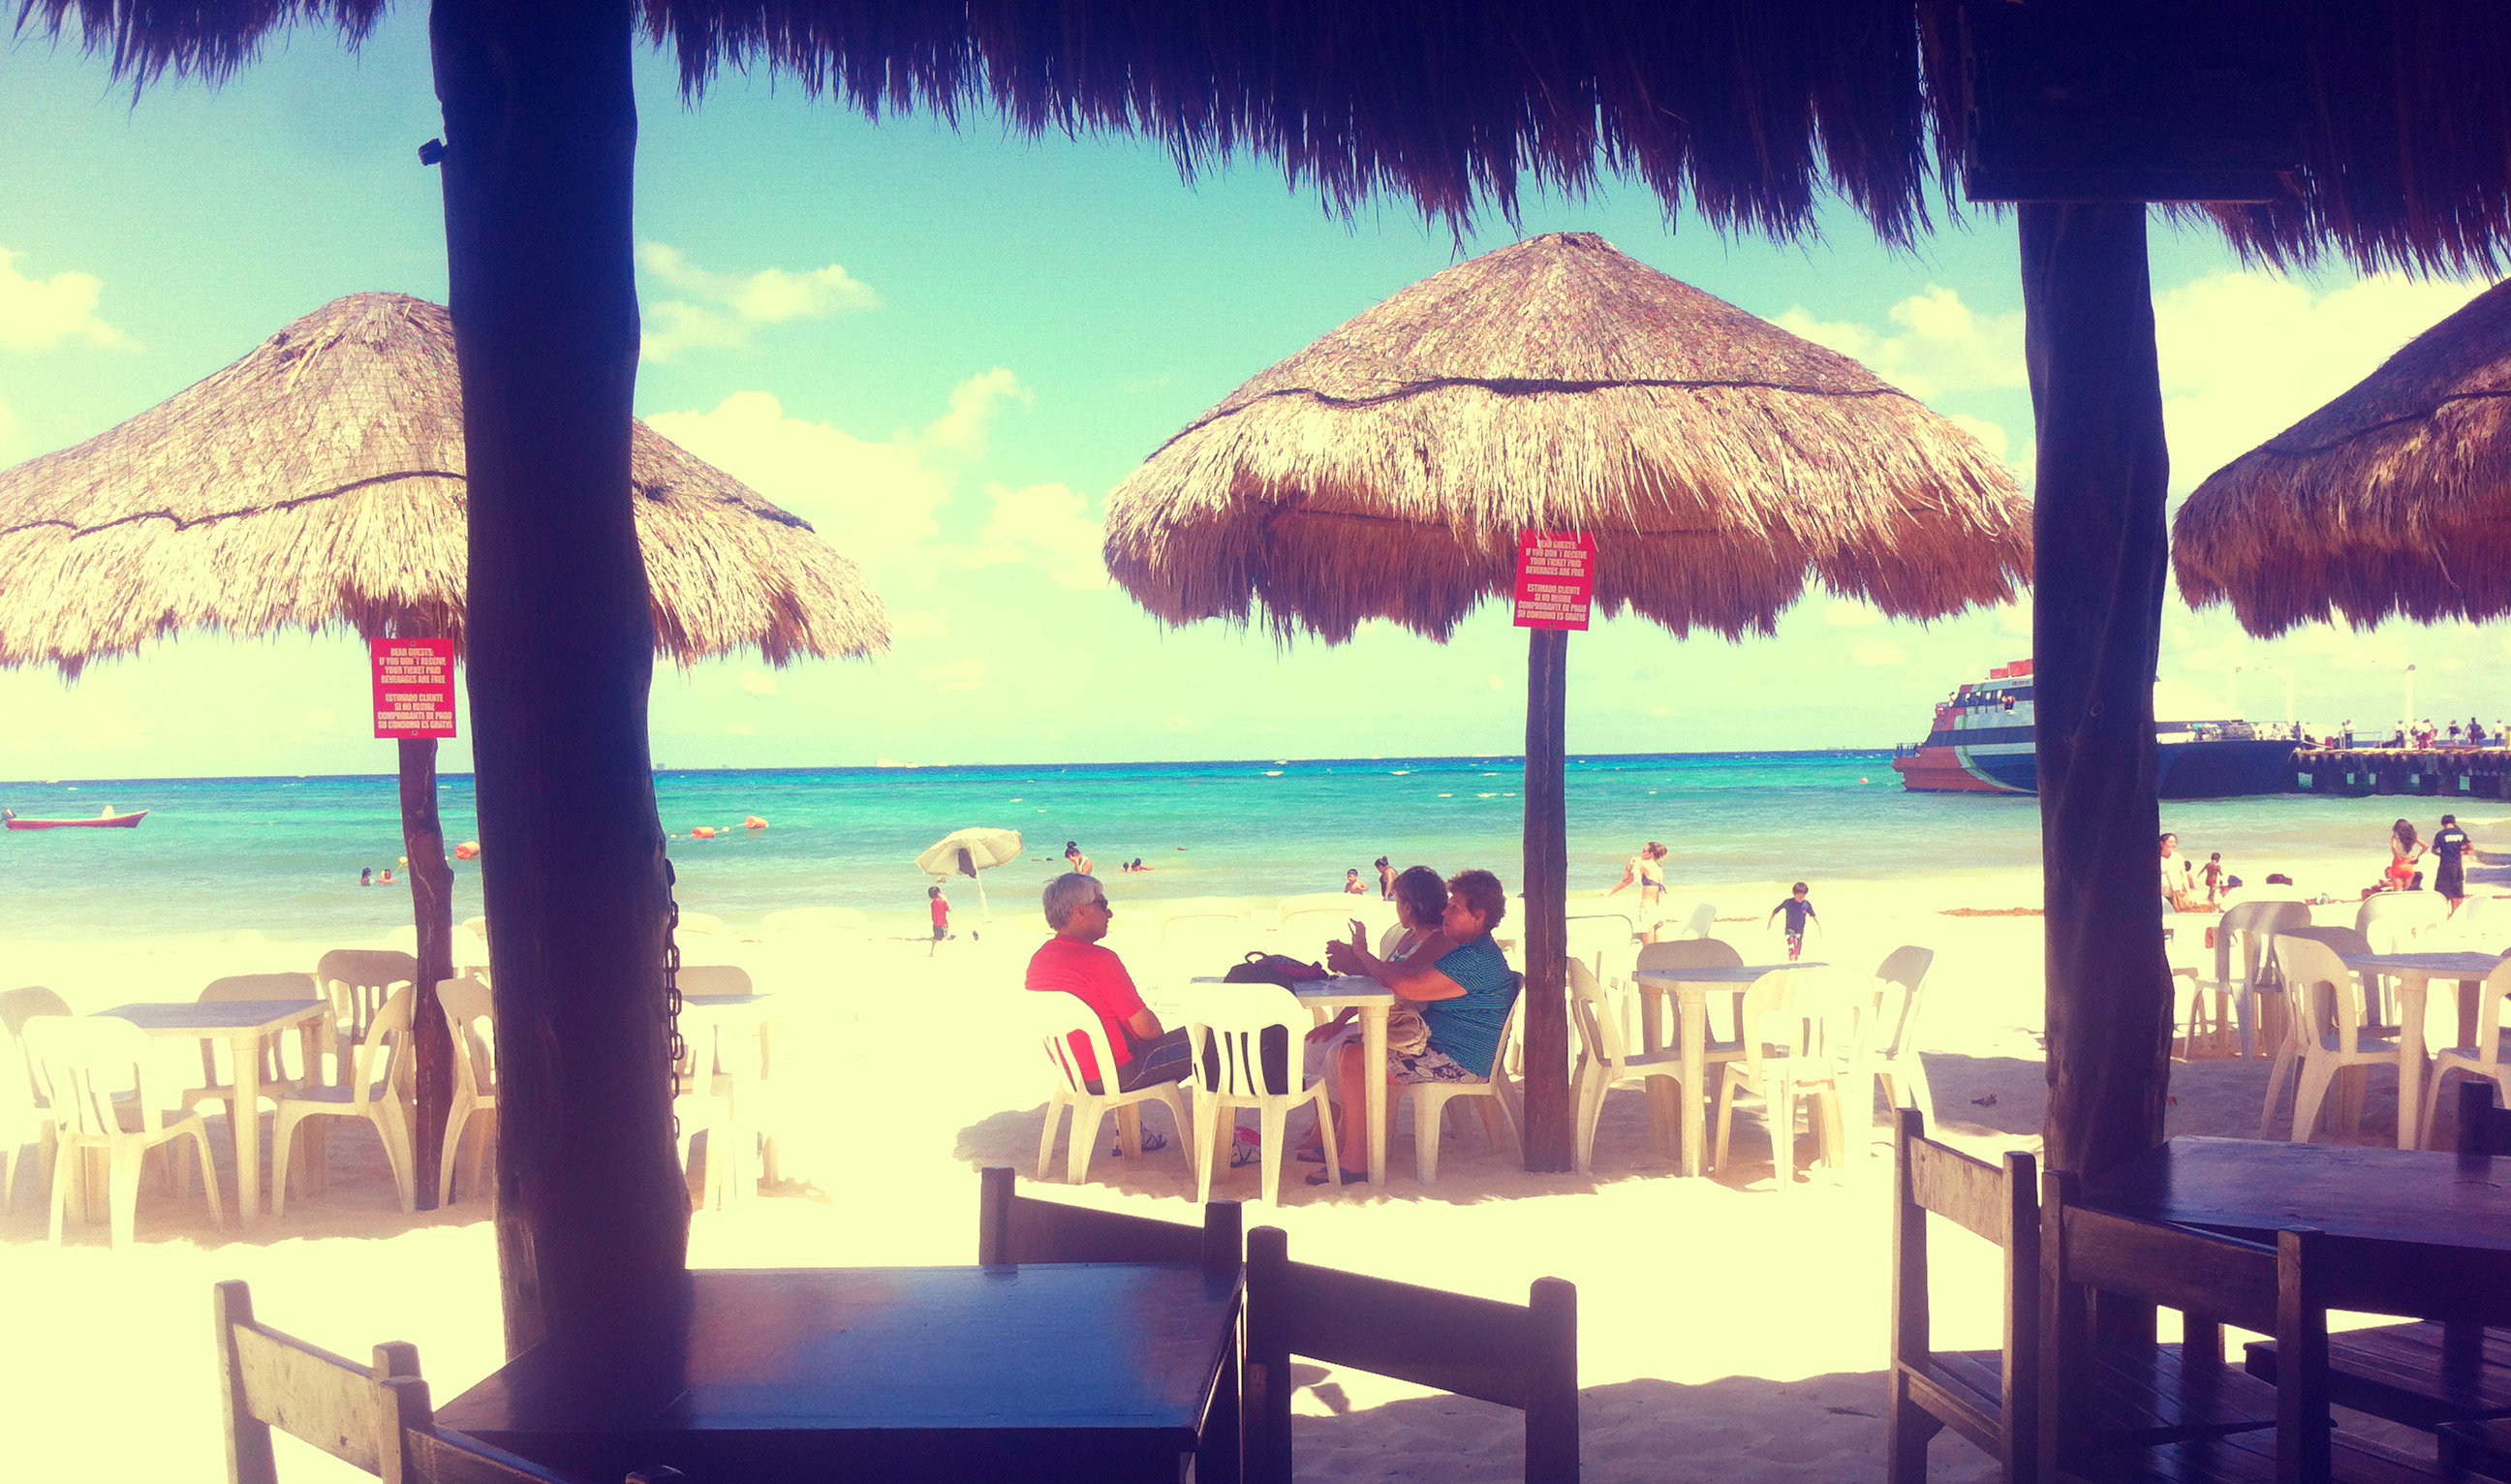 playa del carmen spiaggia